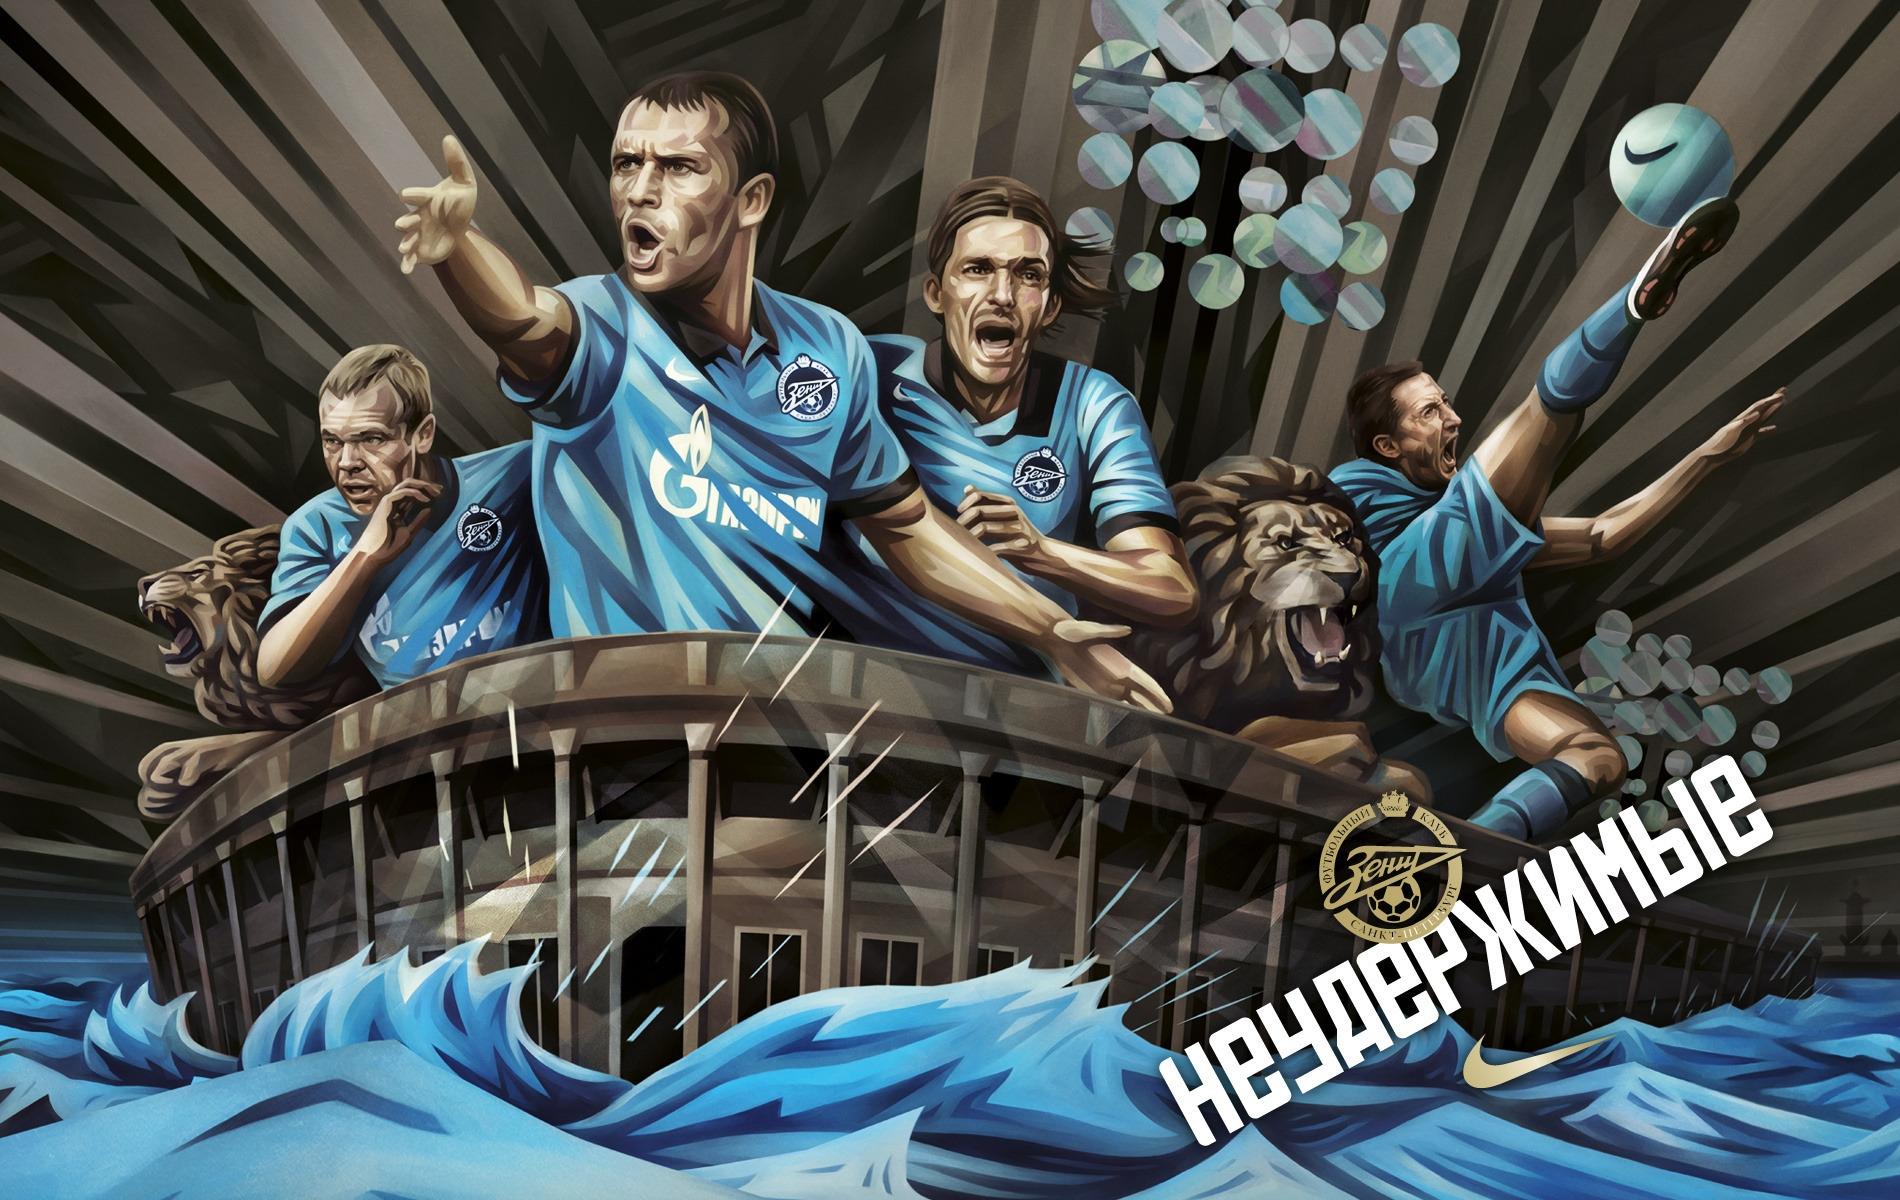 Wallpaper Anime Team Zenith Players Football